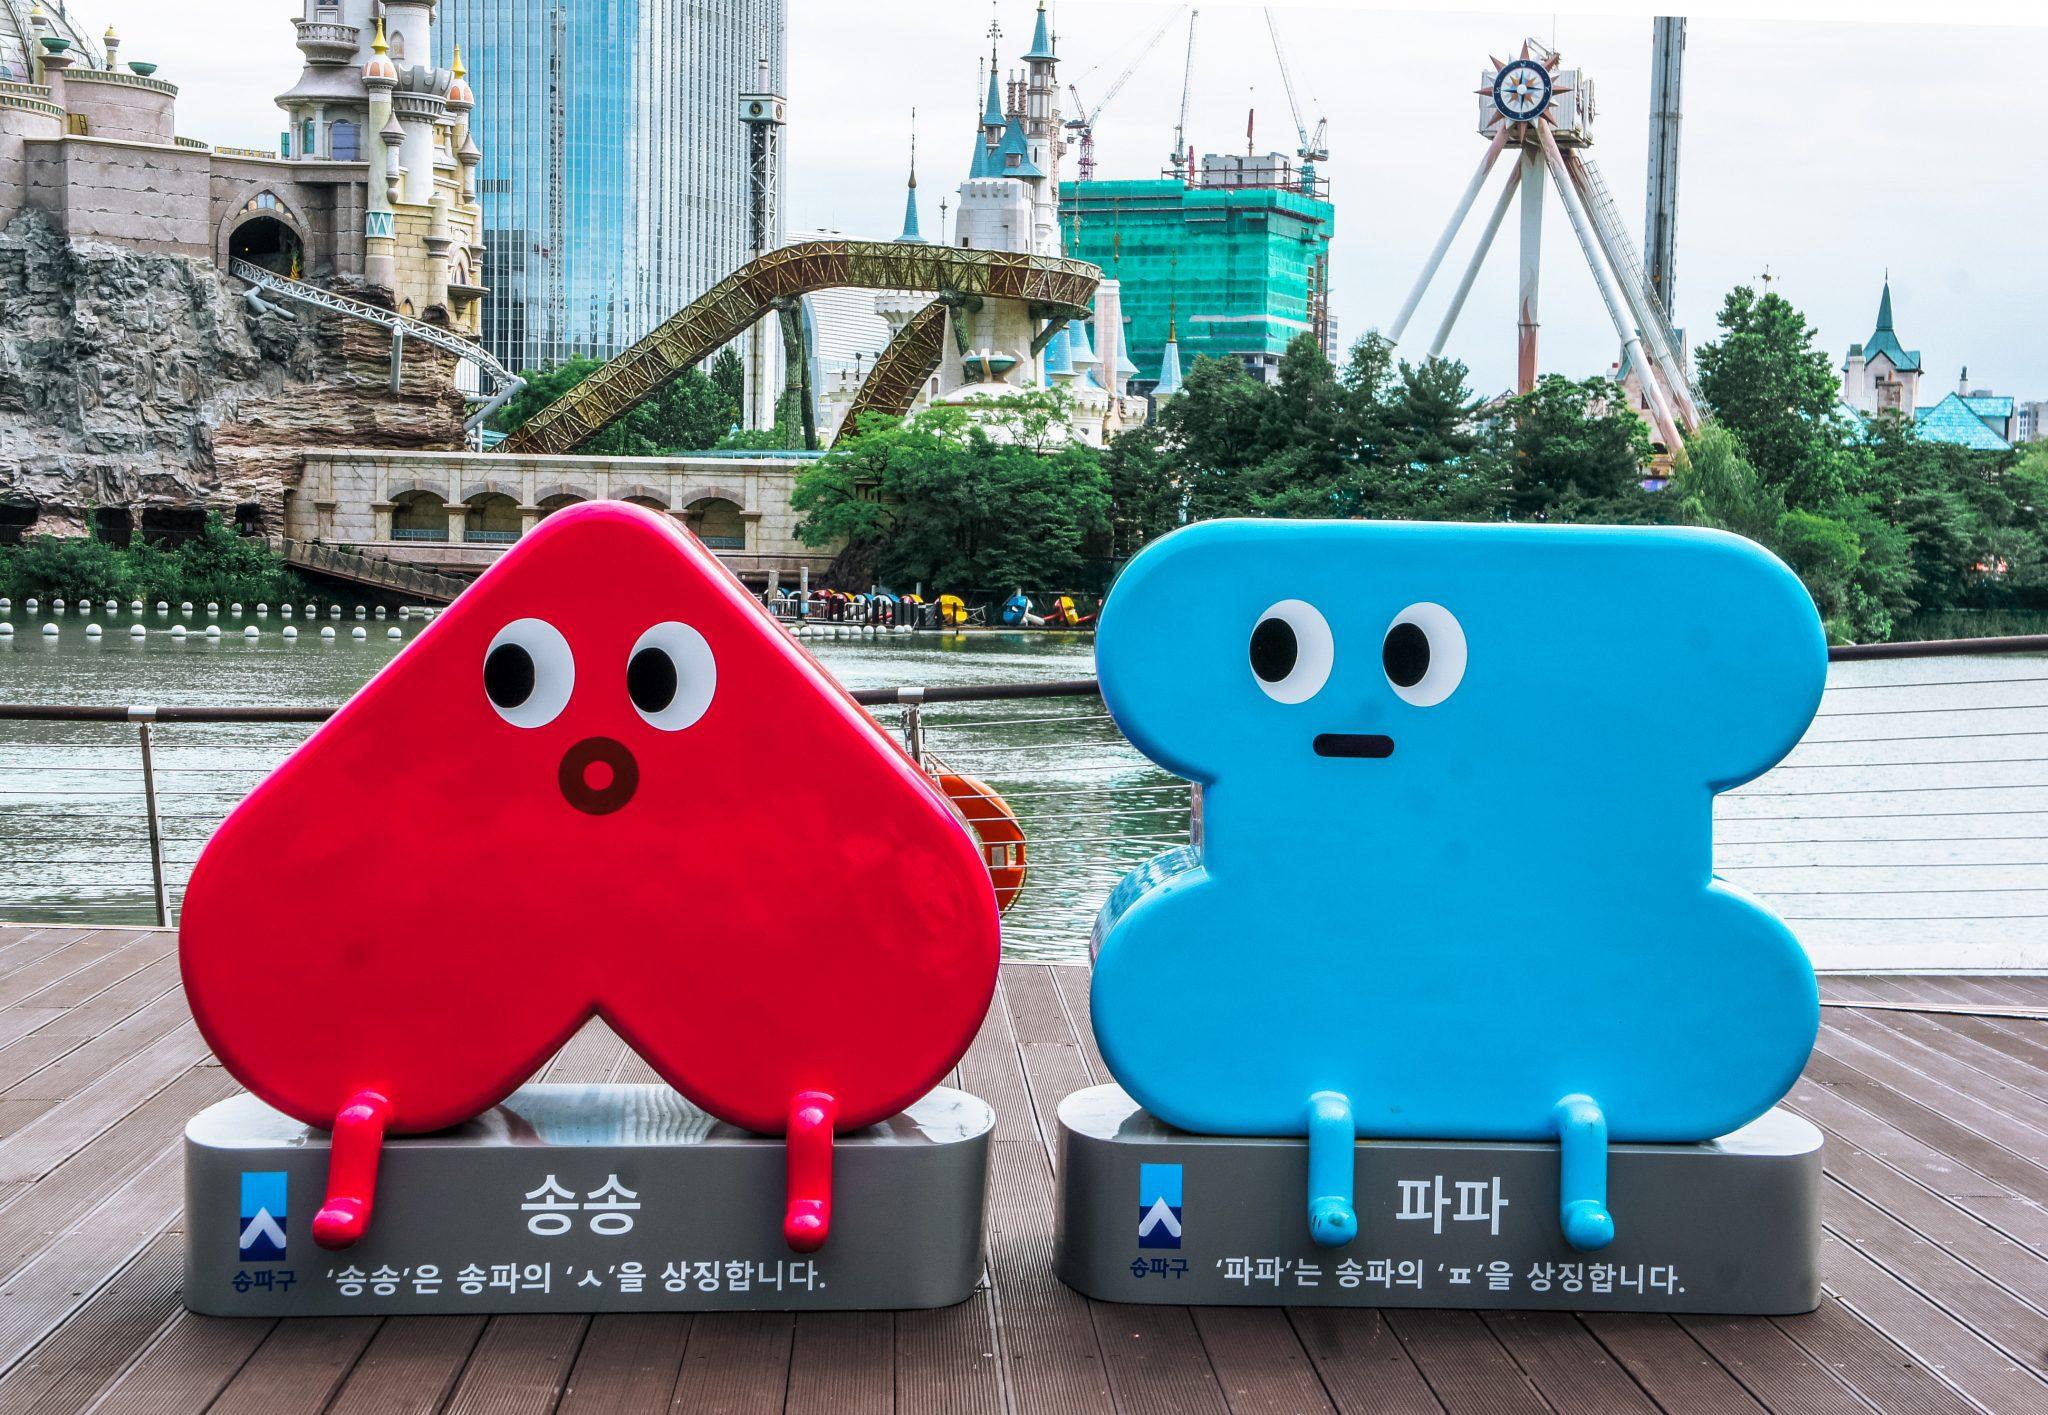 songpa-gu mascots